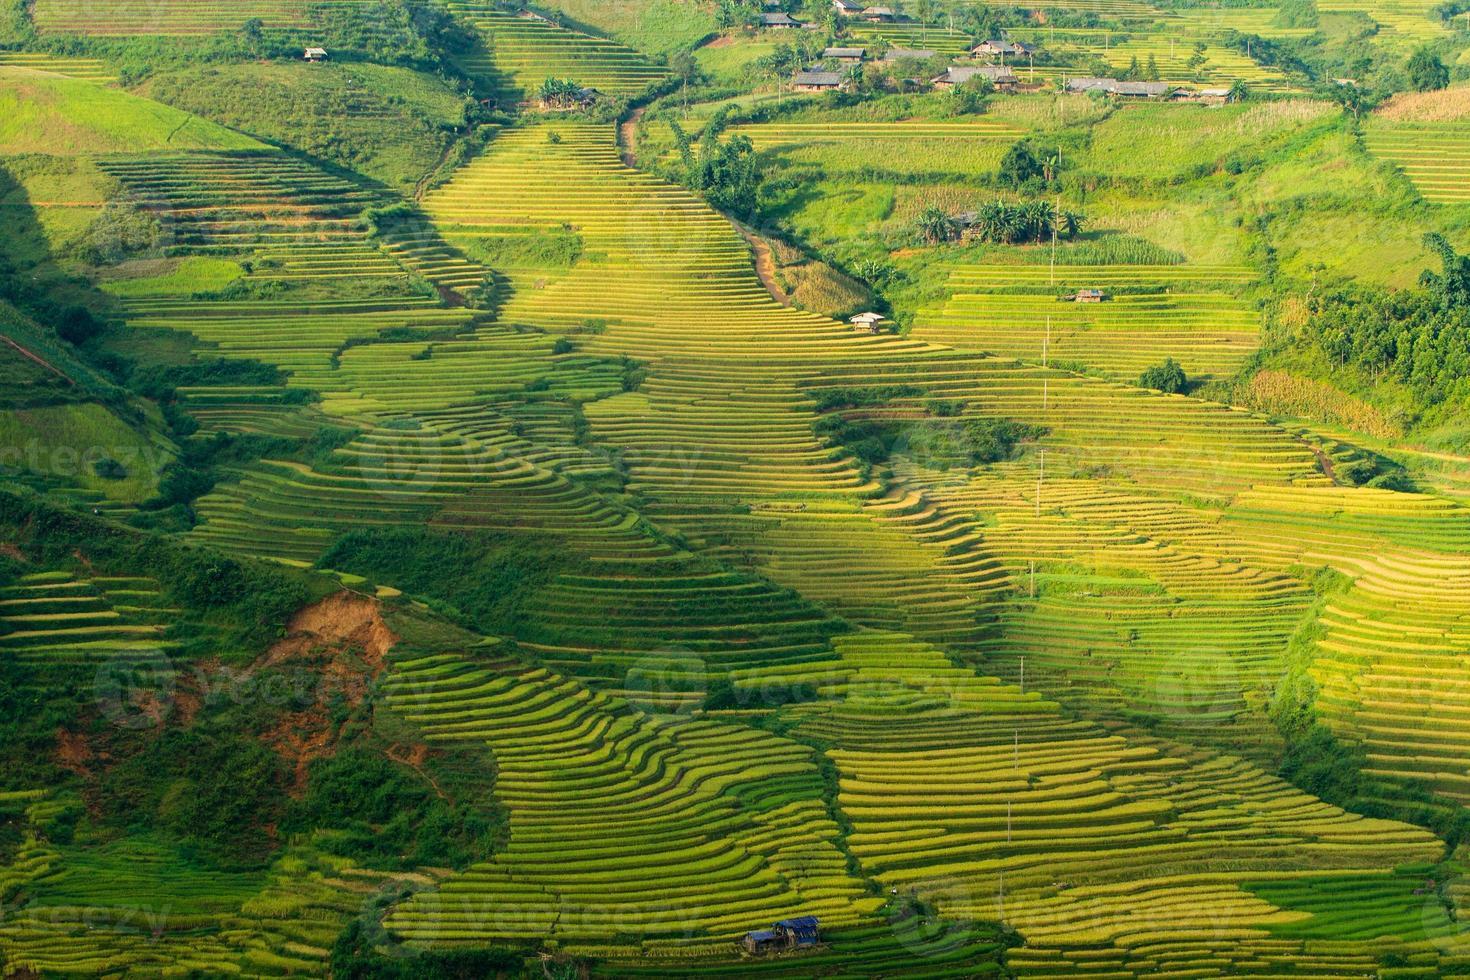 terrazas de arroz en vietnam foto